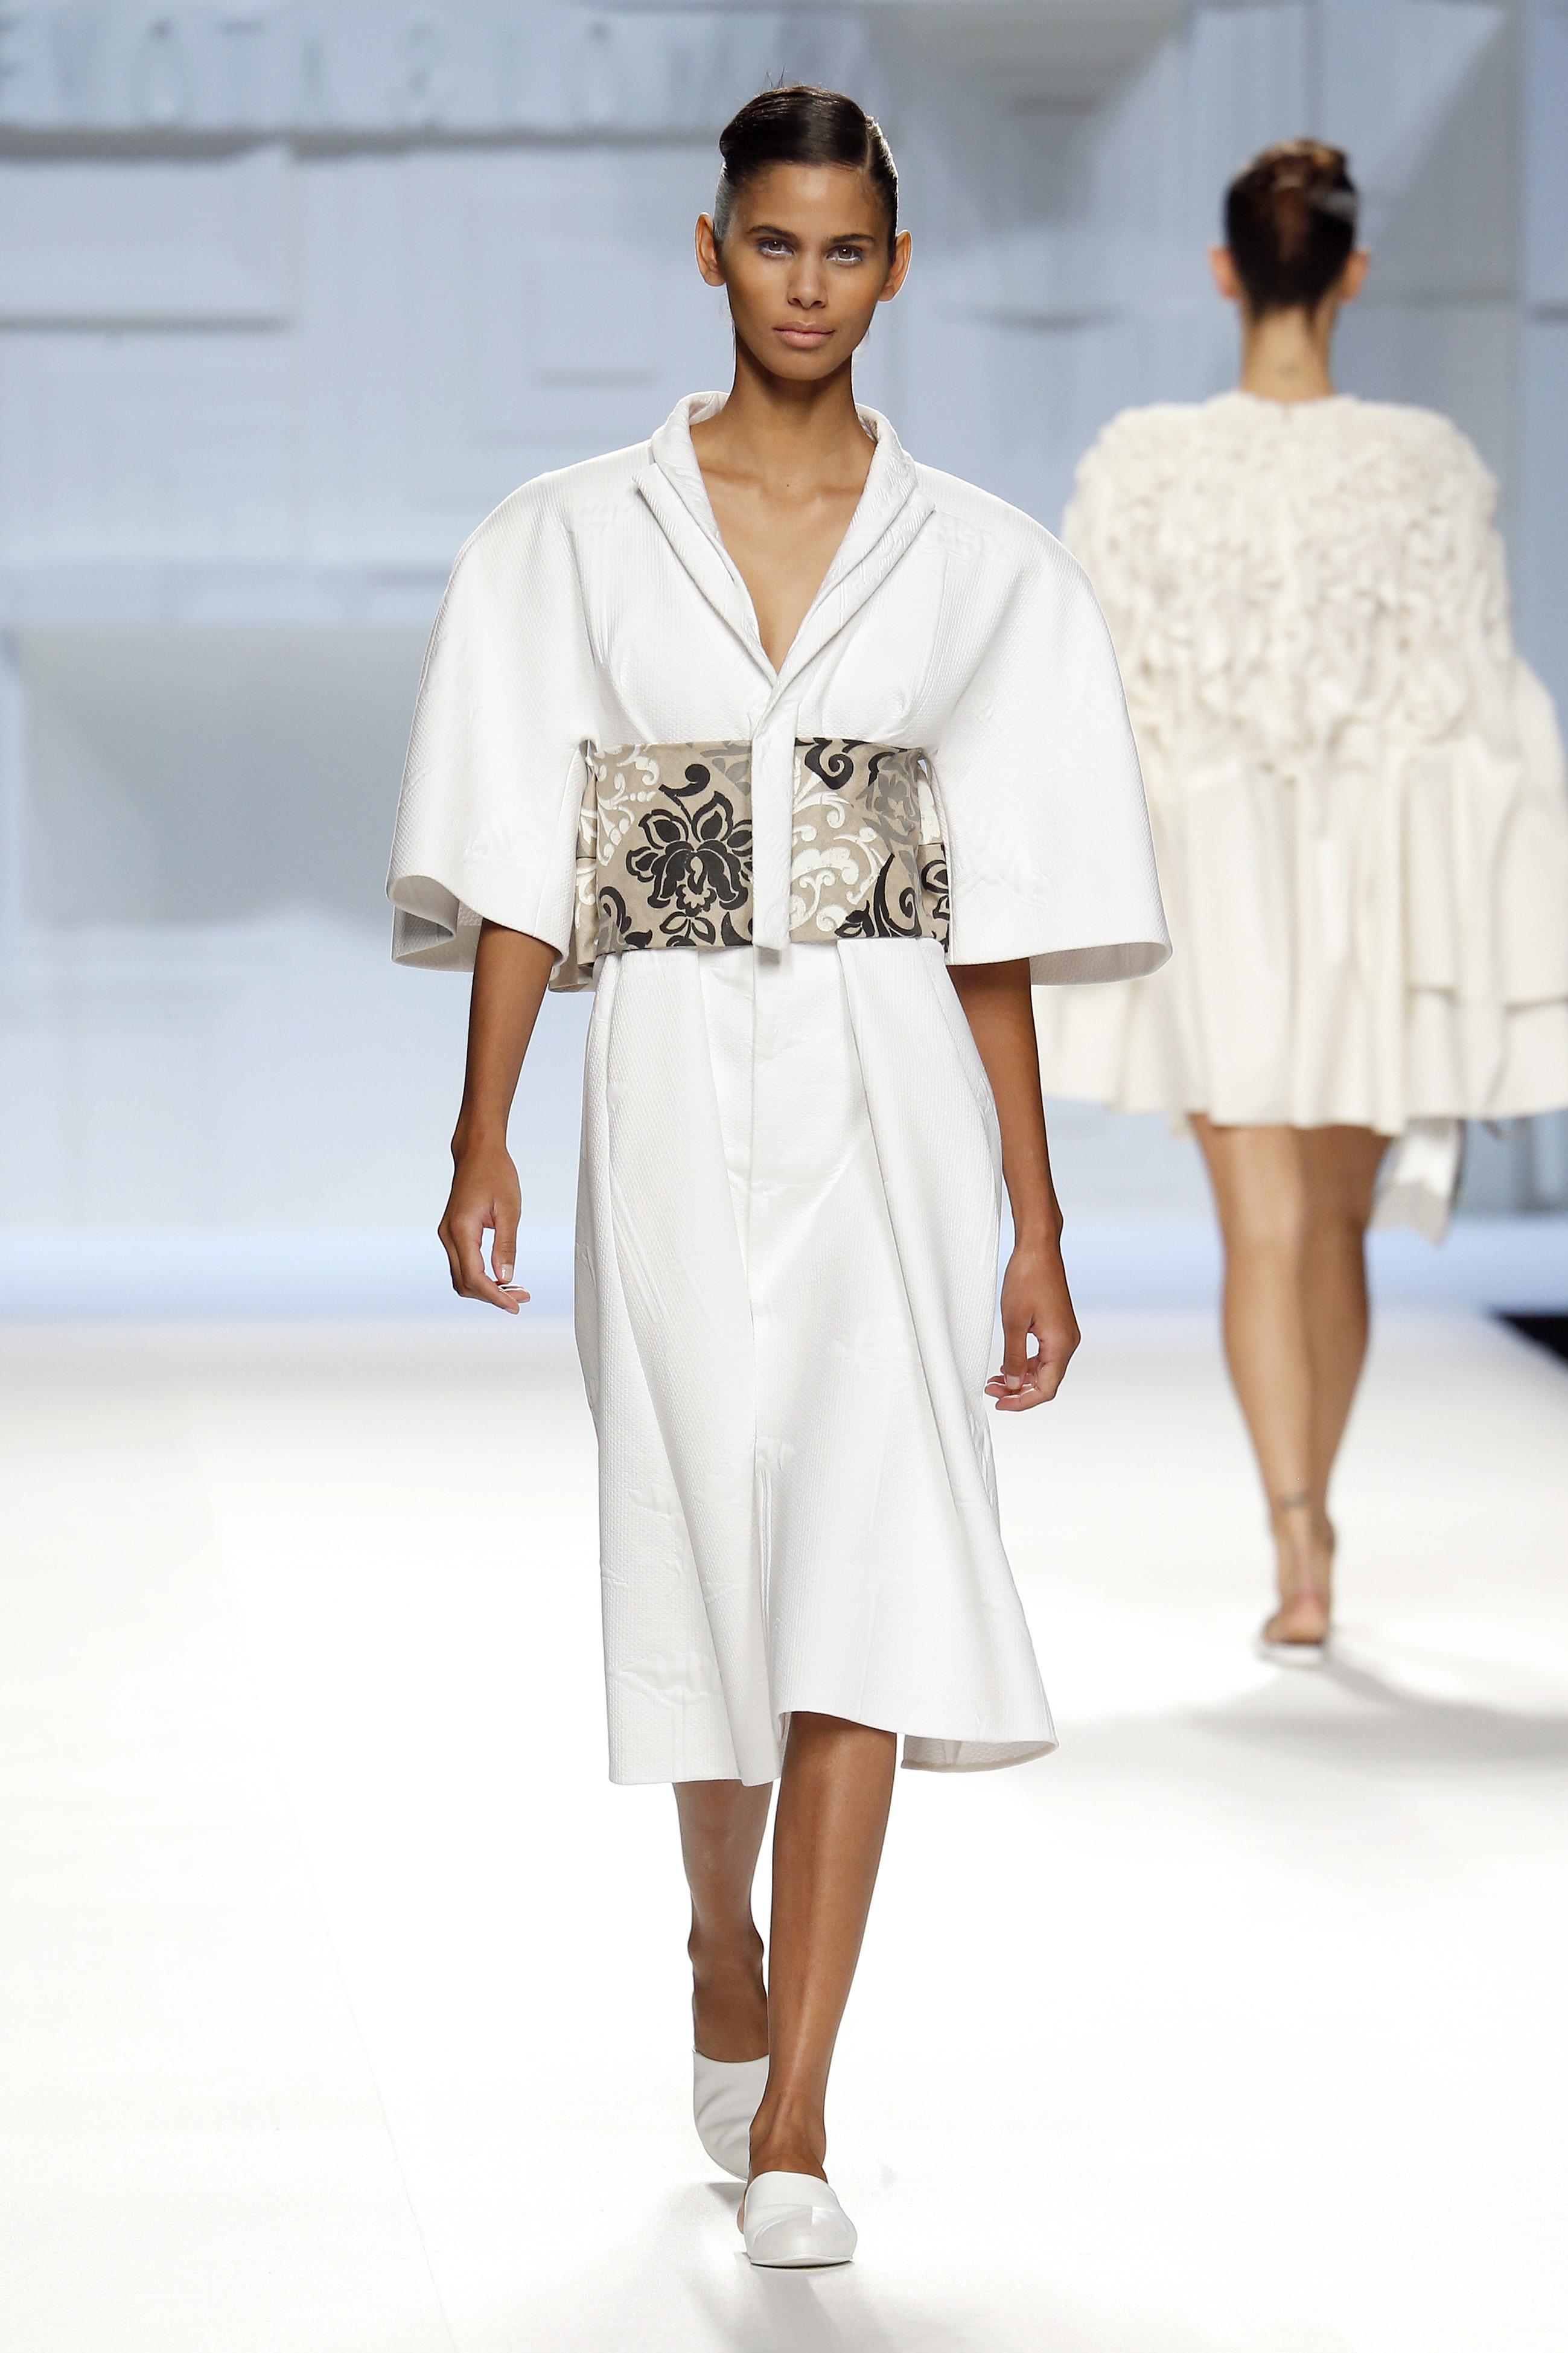 Vestido blanco mangas japonesas